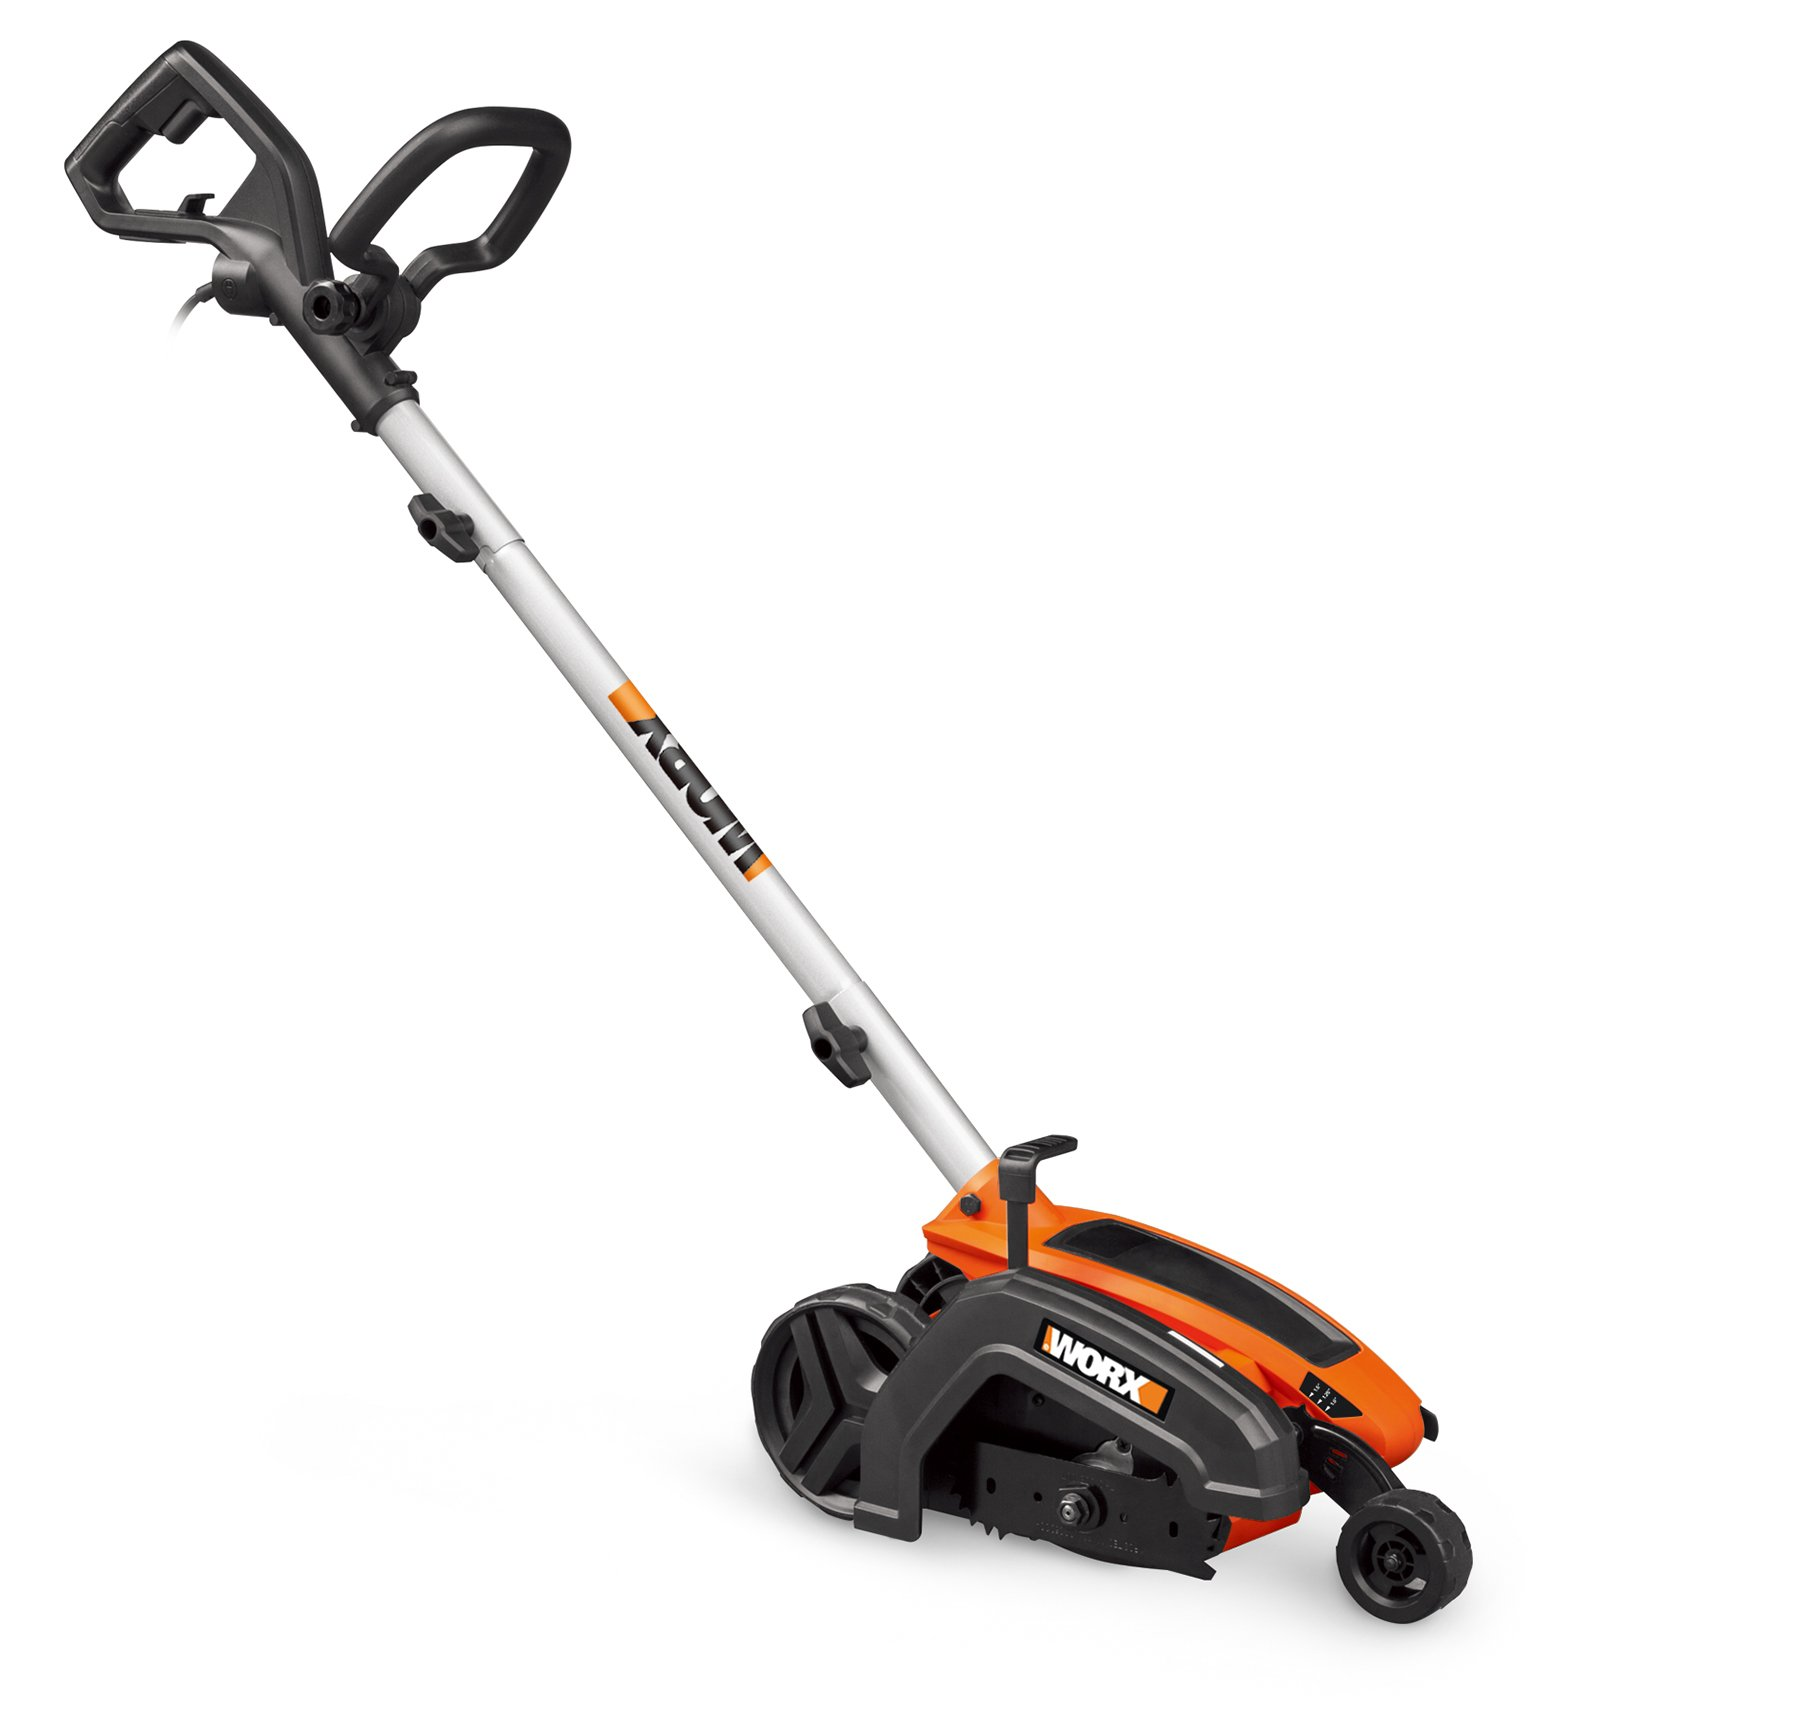 Worx WG896 12A 2-in-1 Electric Lawn Edger, 7.5-Inch